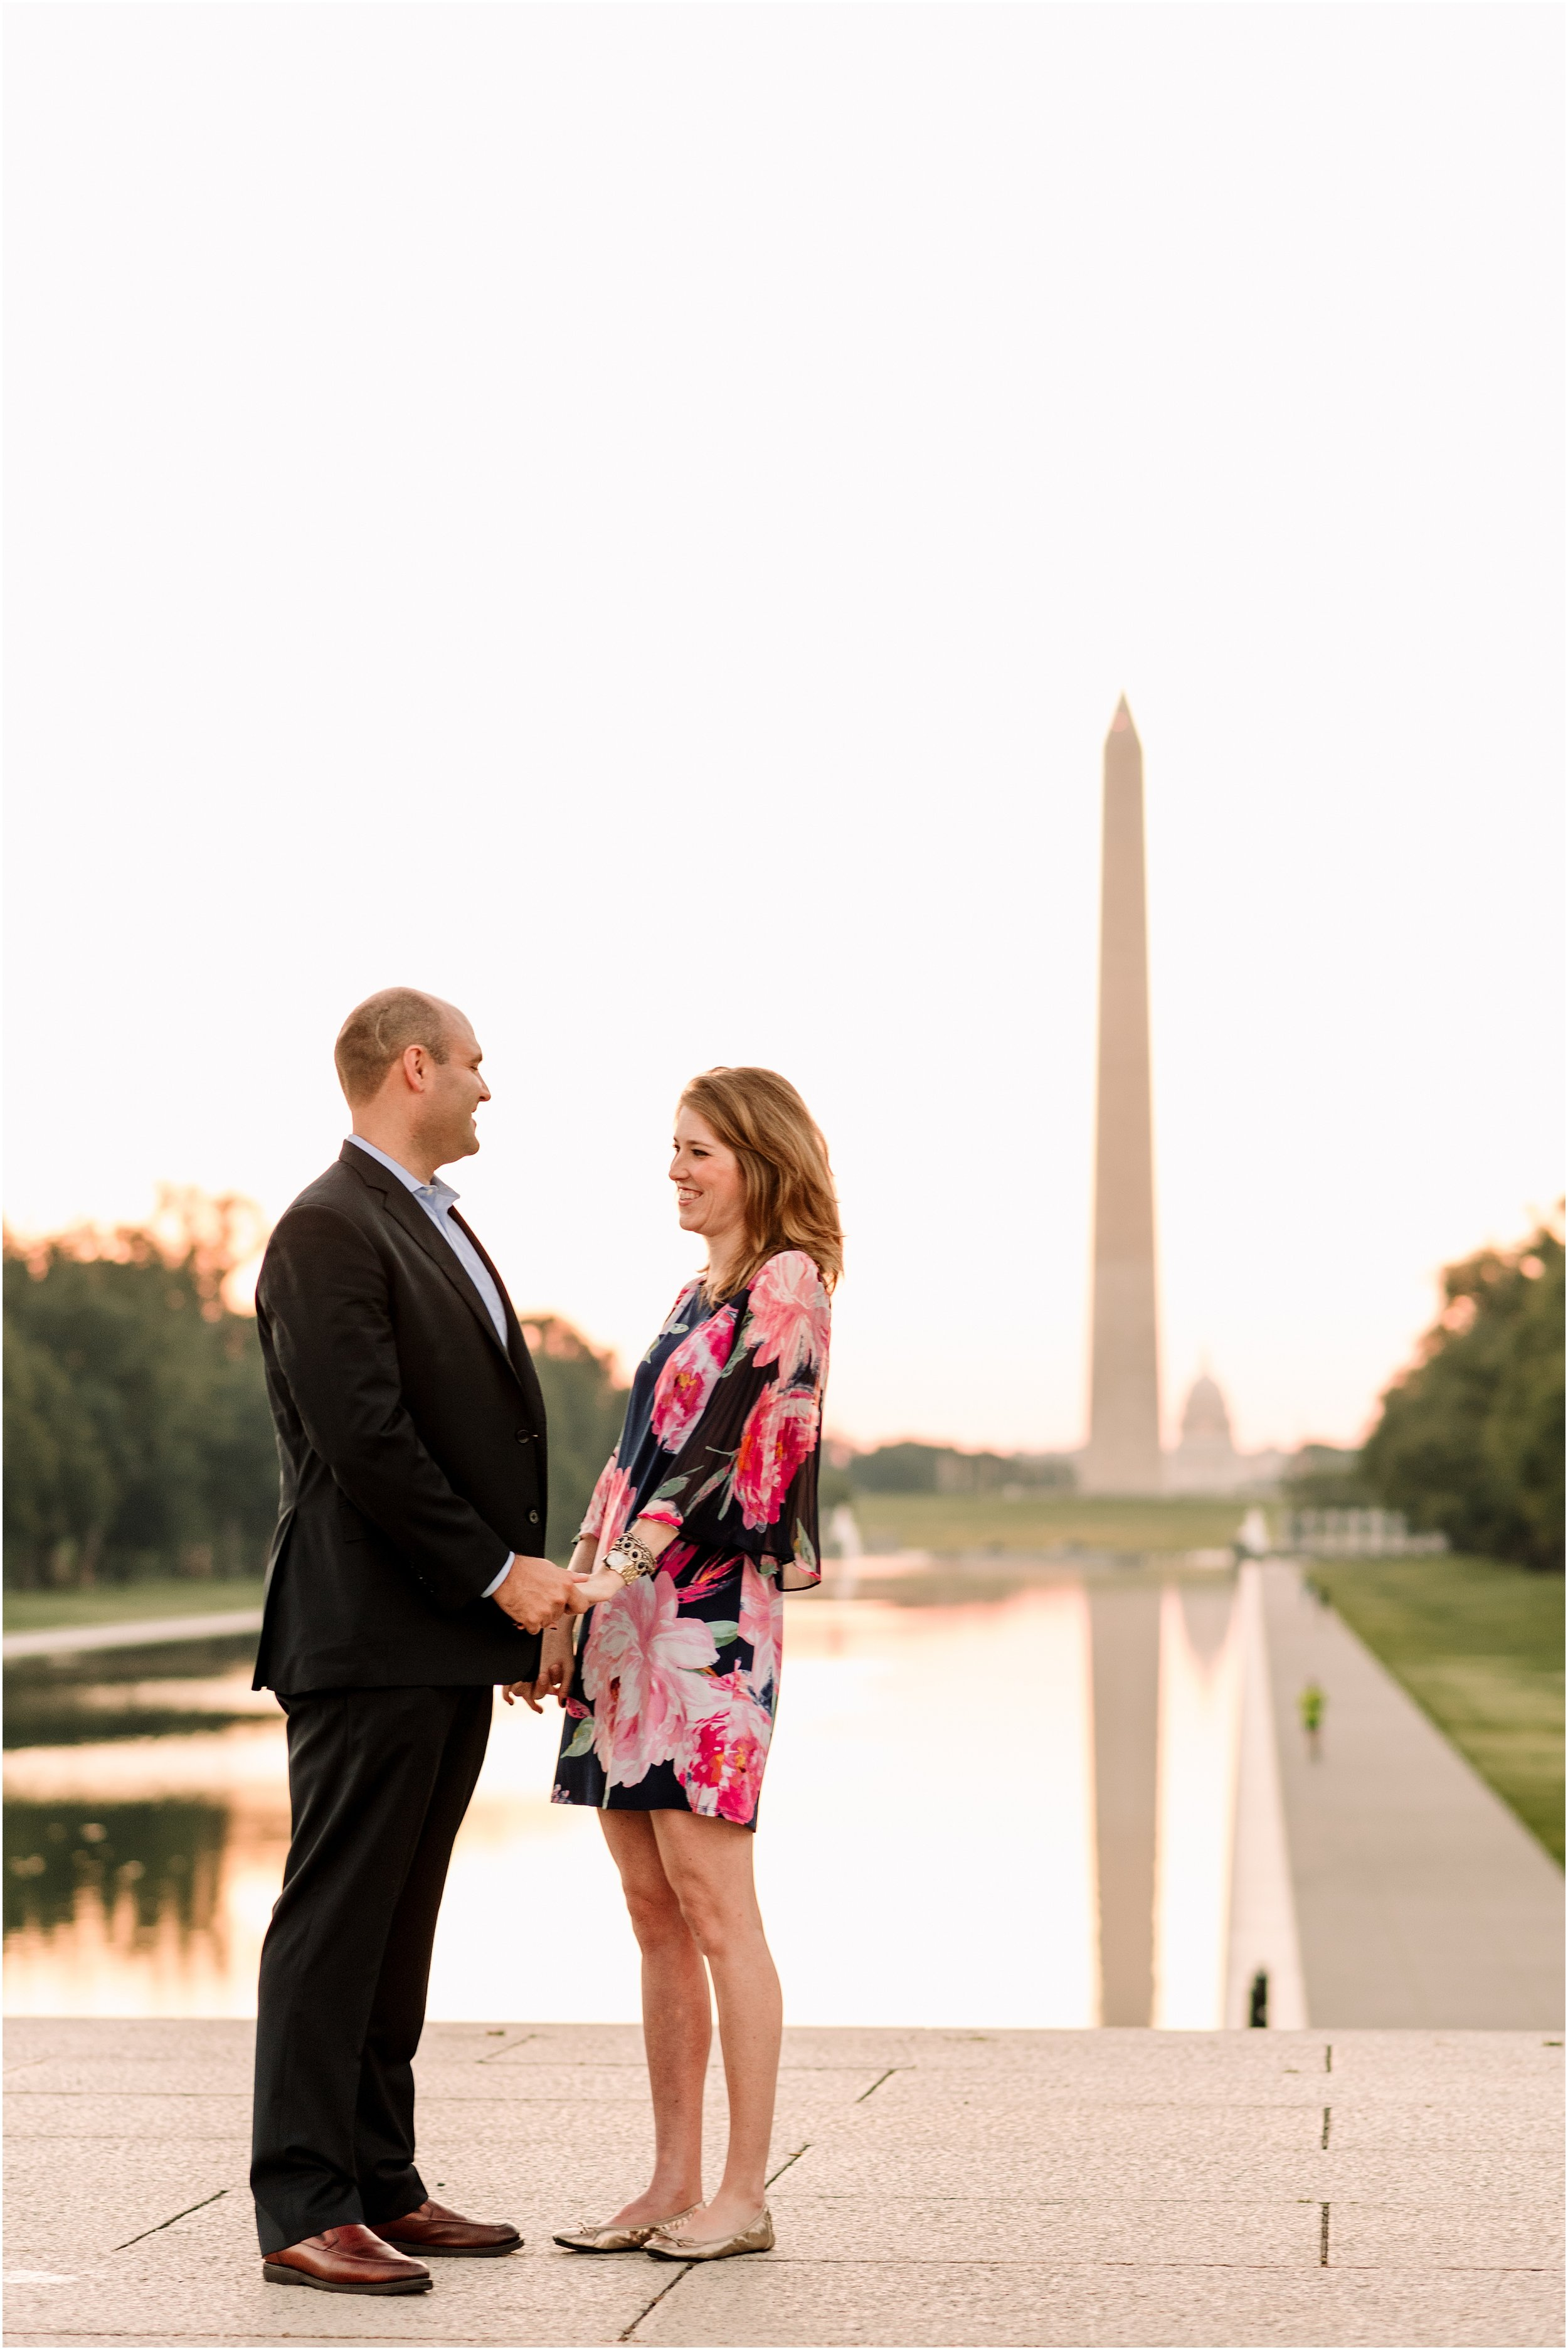 hannah leigh photography Sunrise Jefferson Memorial Engagement Session, Washington DC_1033.jpg